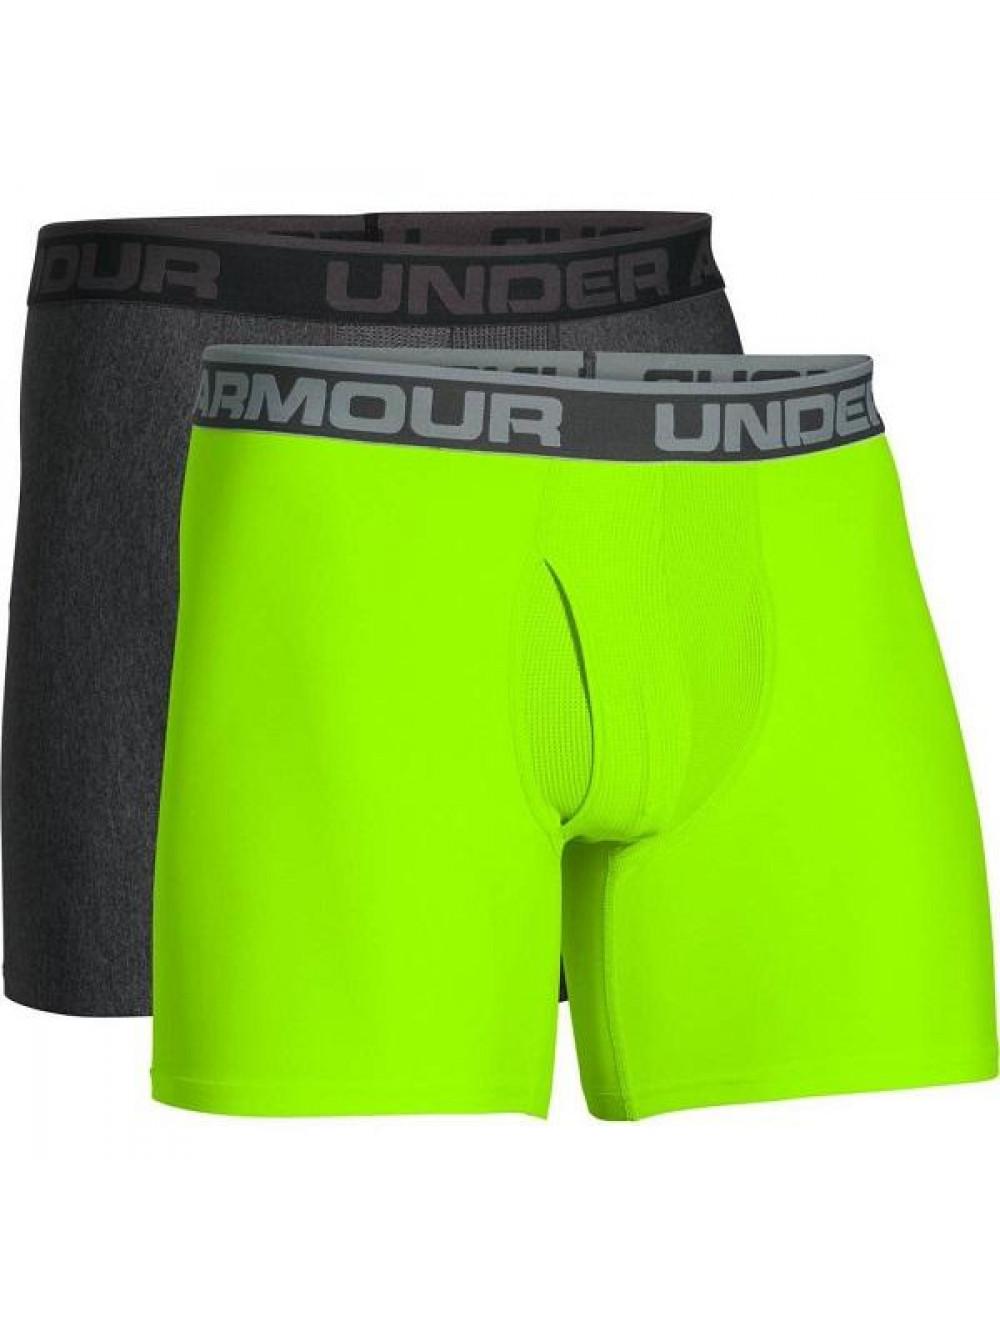 Pánske boxerky Under Armour BOXERJOCK 2-pack, zelené a sivé